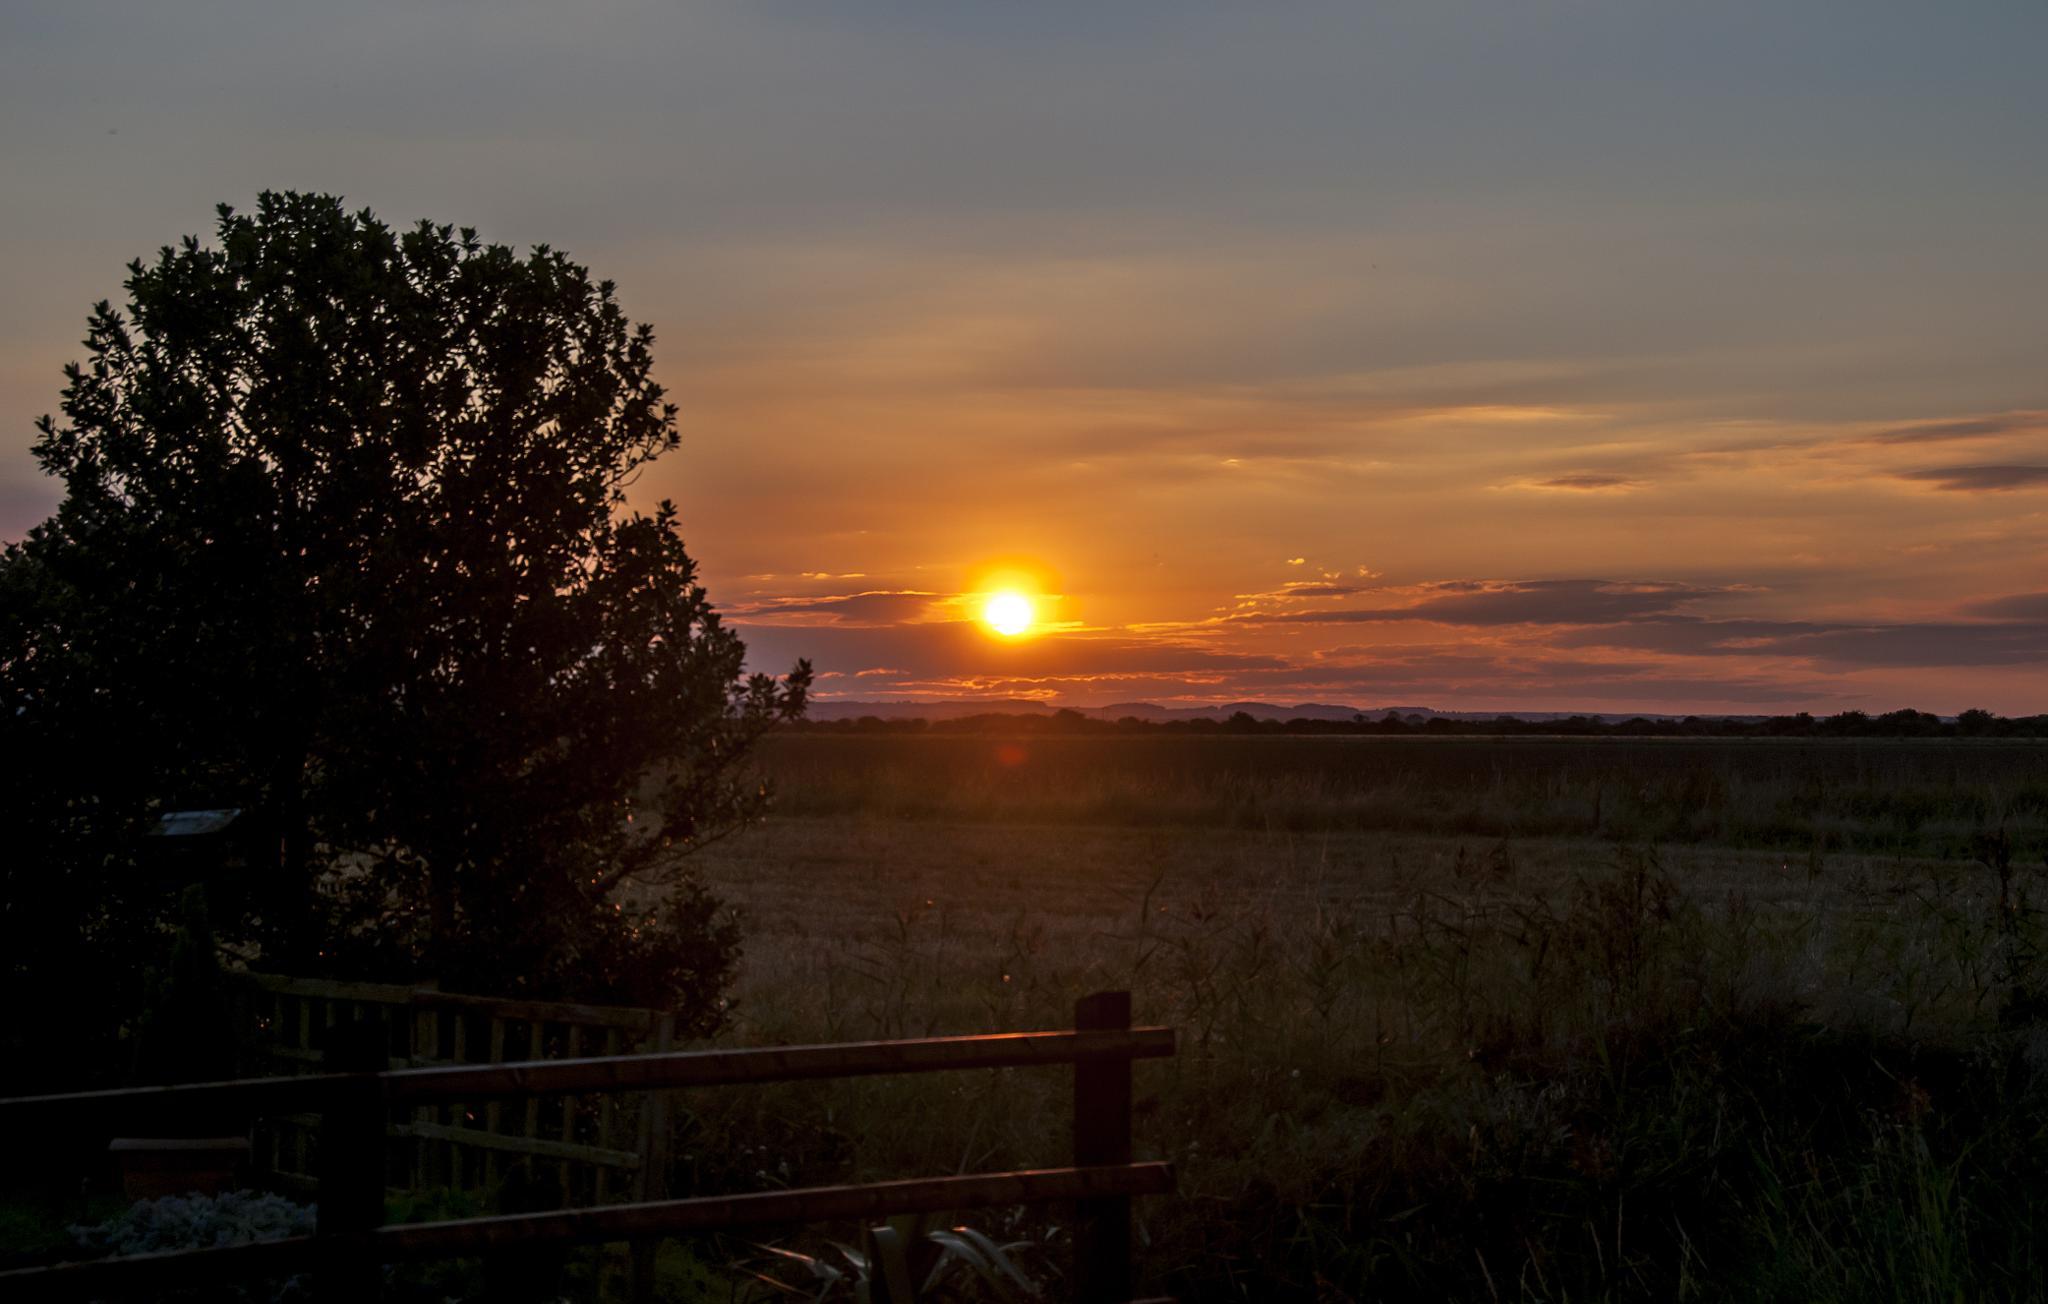 Mablethorpe Sunset by cakey.white